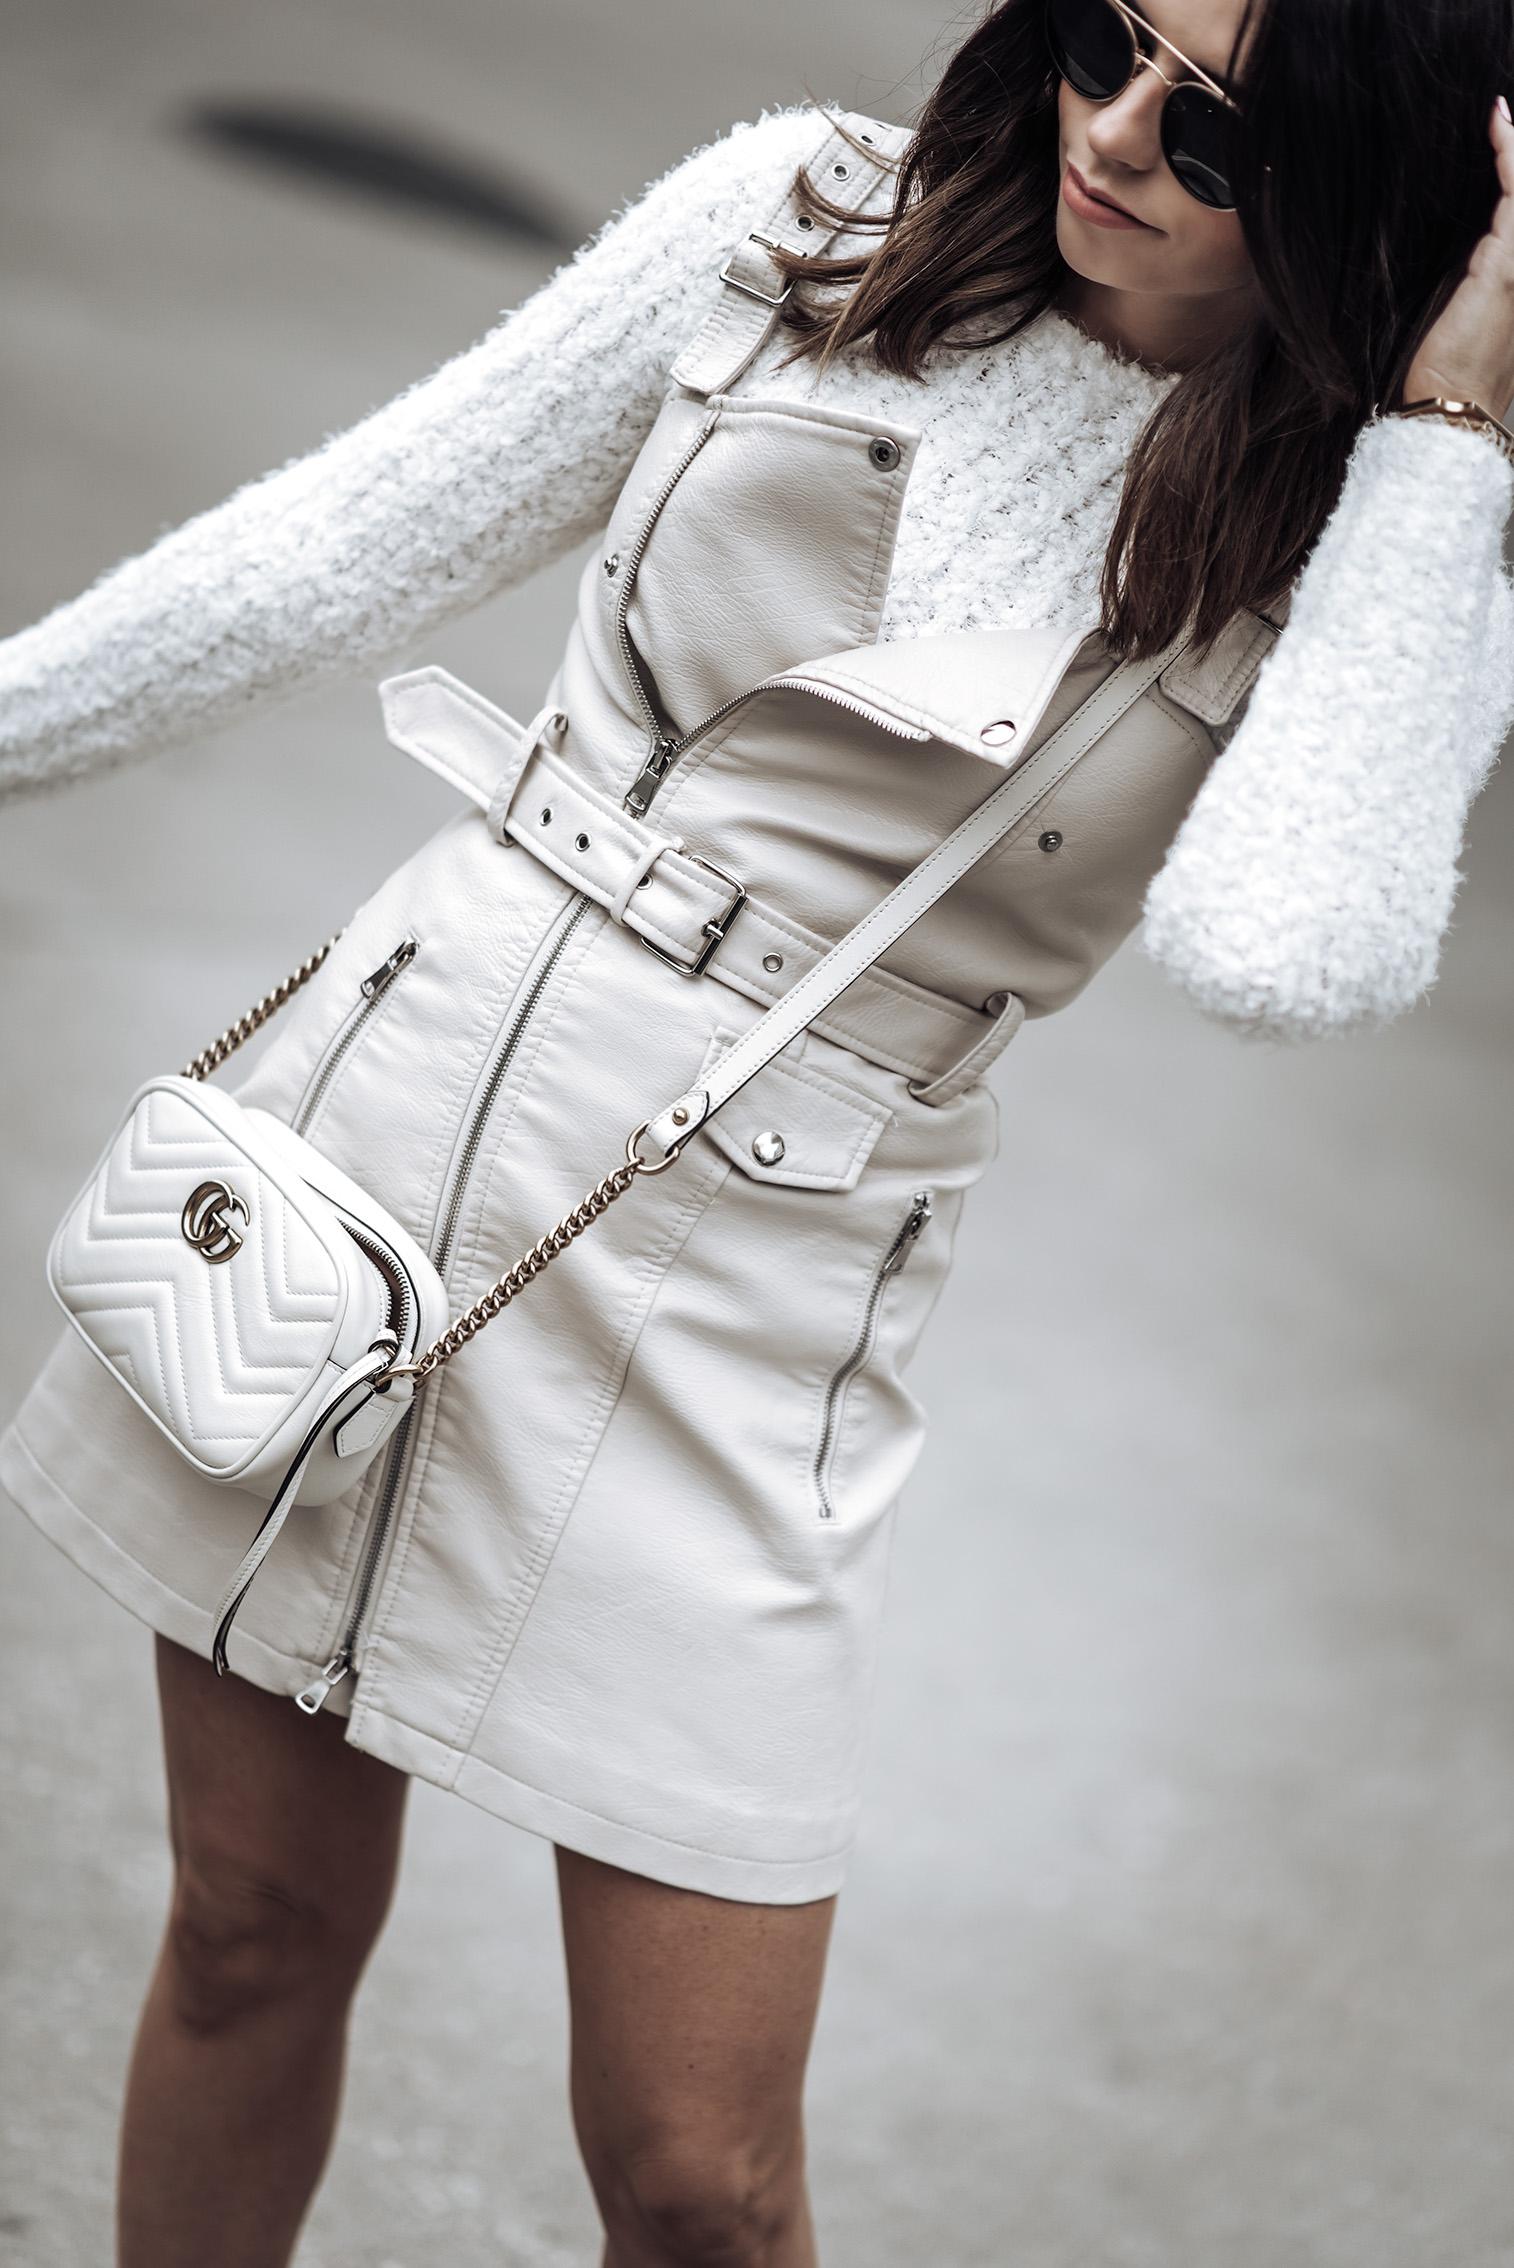 Eva Biker Mini Dress Size small | Fuzzy Knit Sweater(runs small, wearing a medium) | Superga Platform Sneakers | GG Marmont Gucci Bag | Sunnies #streetstyle2018 #sneakeroutfits